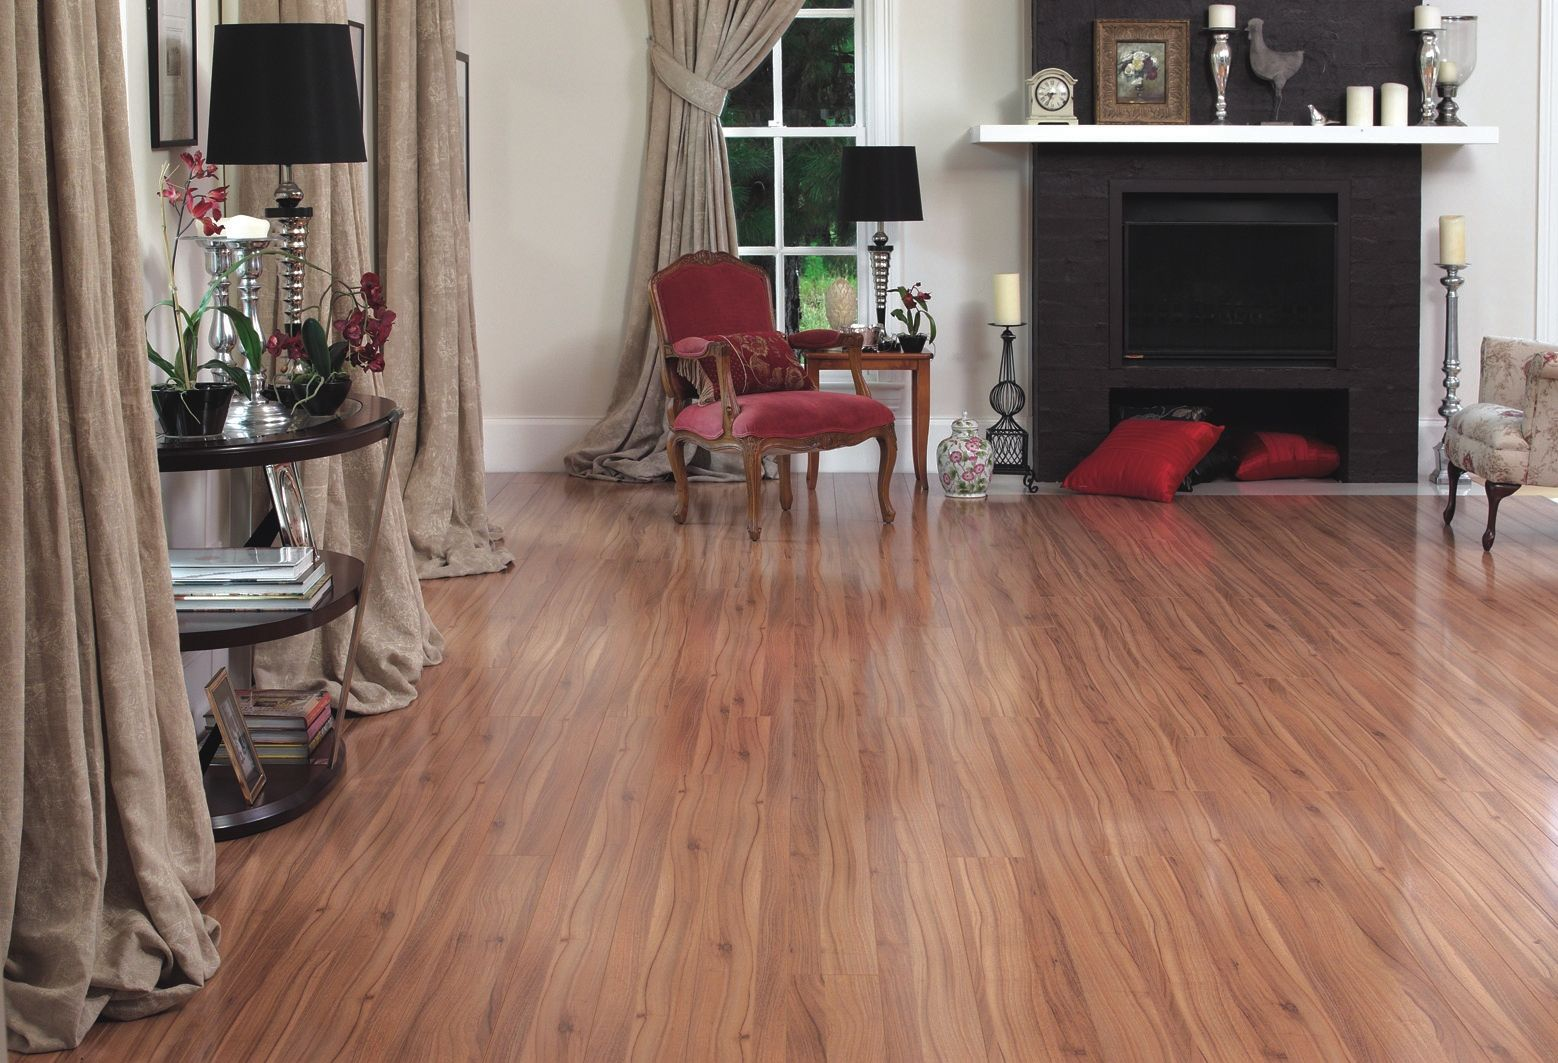 Timber Impressions 'Queensland Walnut' Laminate Flooring - The ...